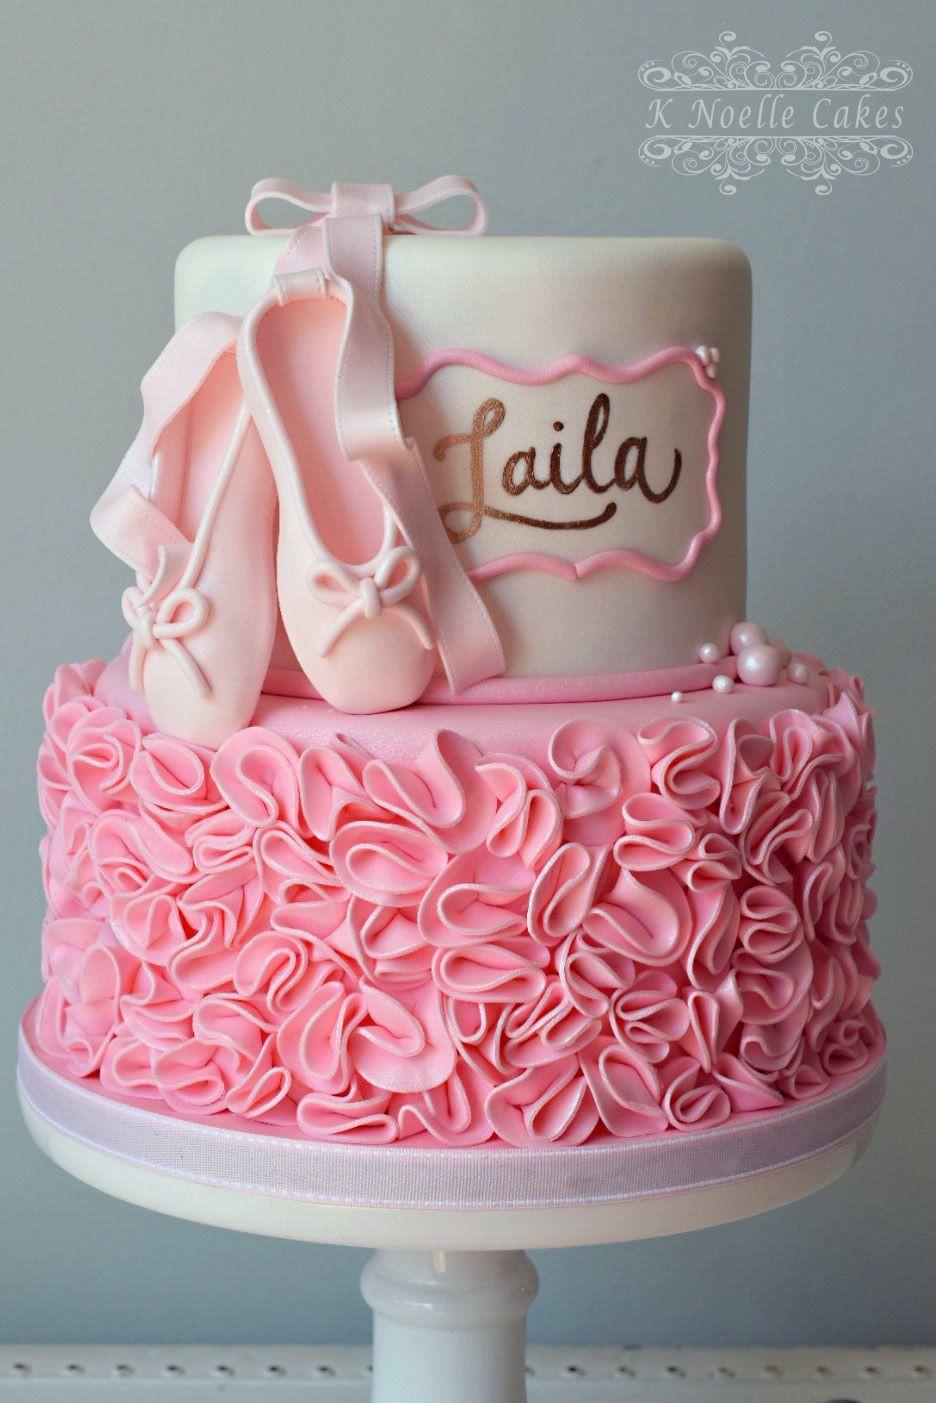 Best ideas about Ballerina Birthday Cake . Save or Pin Ballerina theme birthday cake By K Noelle Cakes Now.